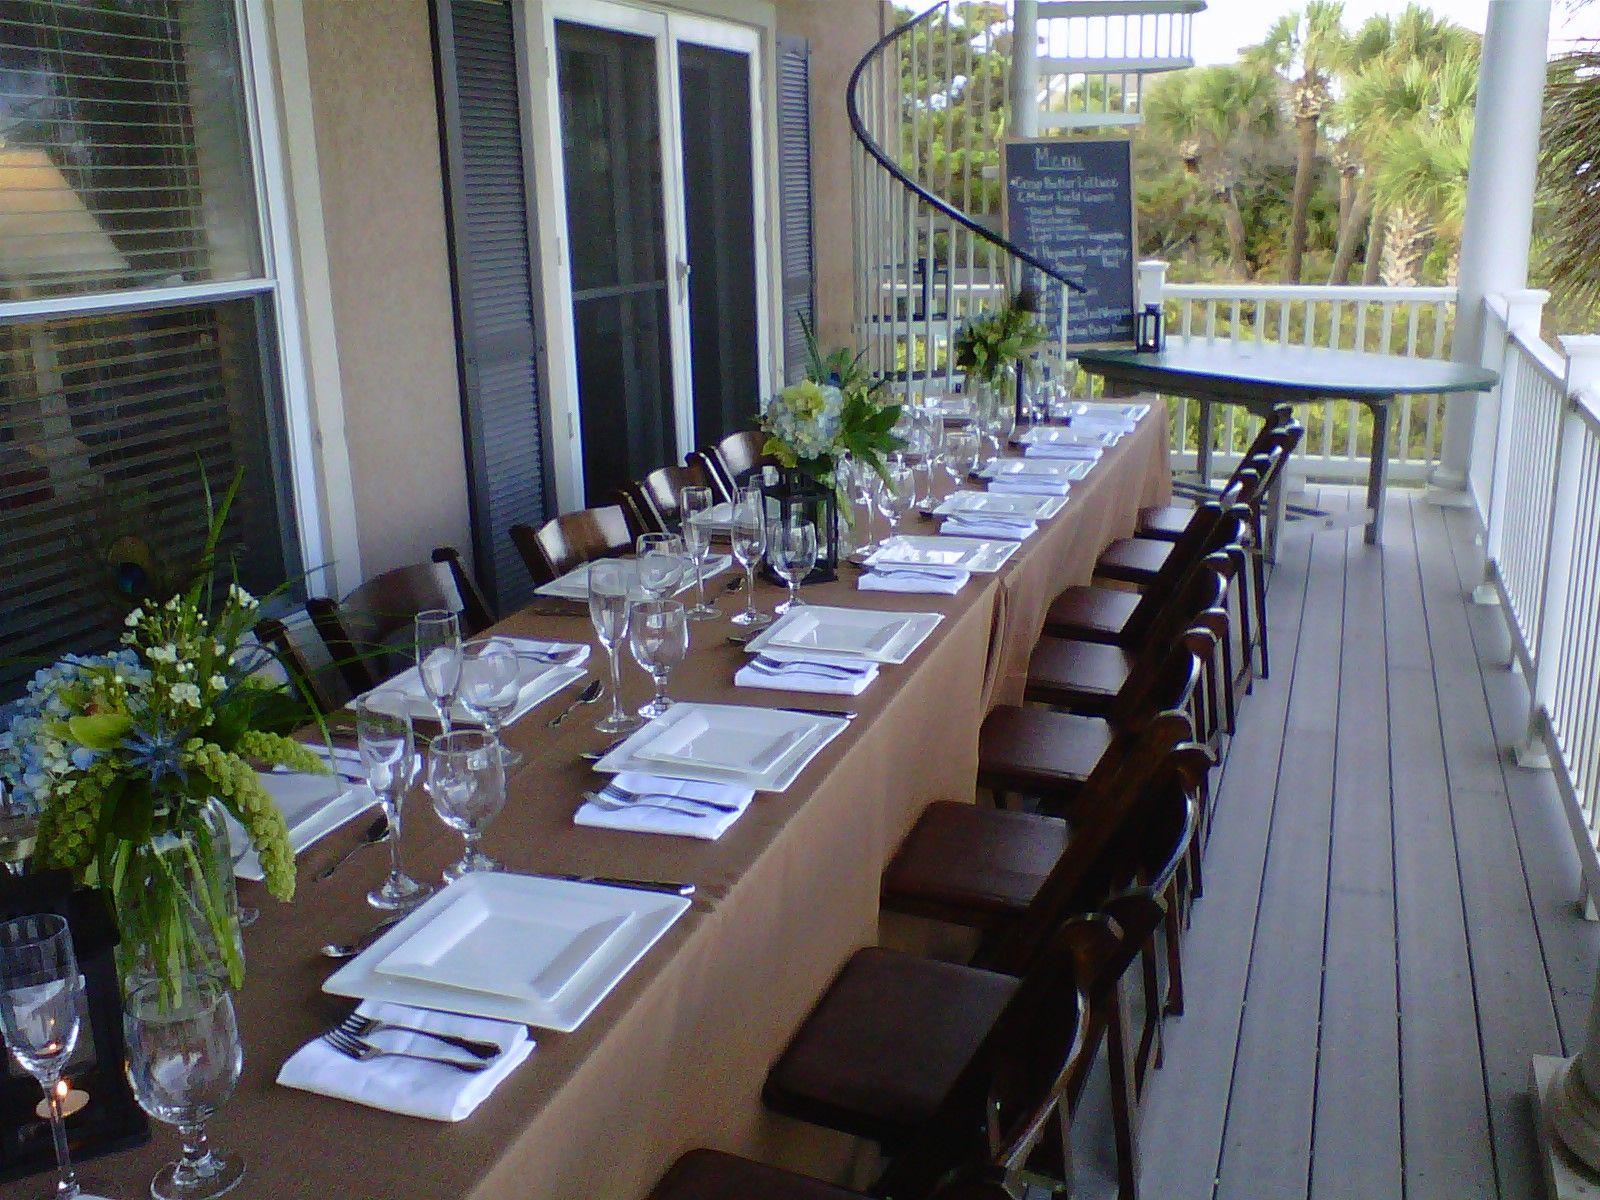 Wedding Rehearsal Dinner Table Ideas To Create Inexpensive Eal Hilton Head Island Vibe